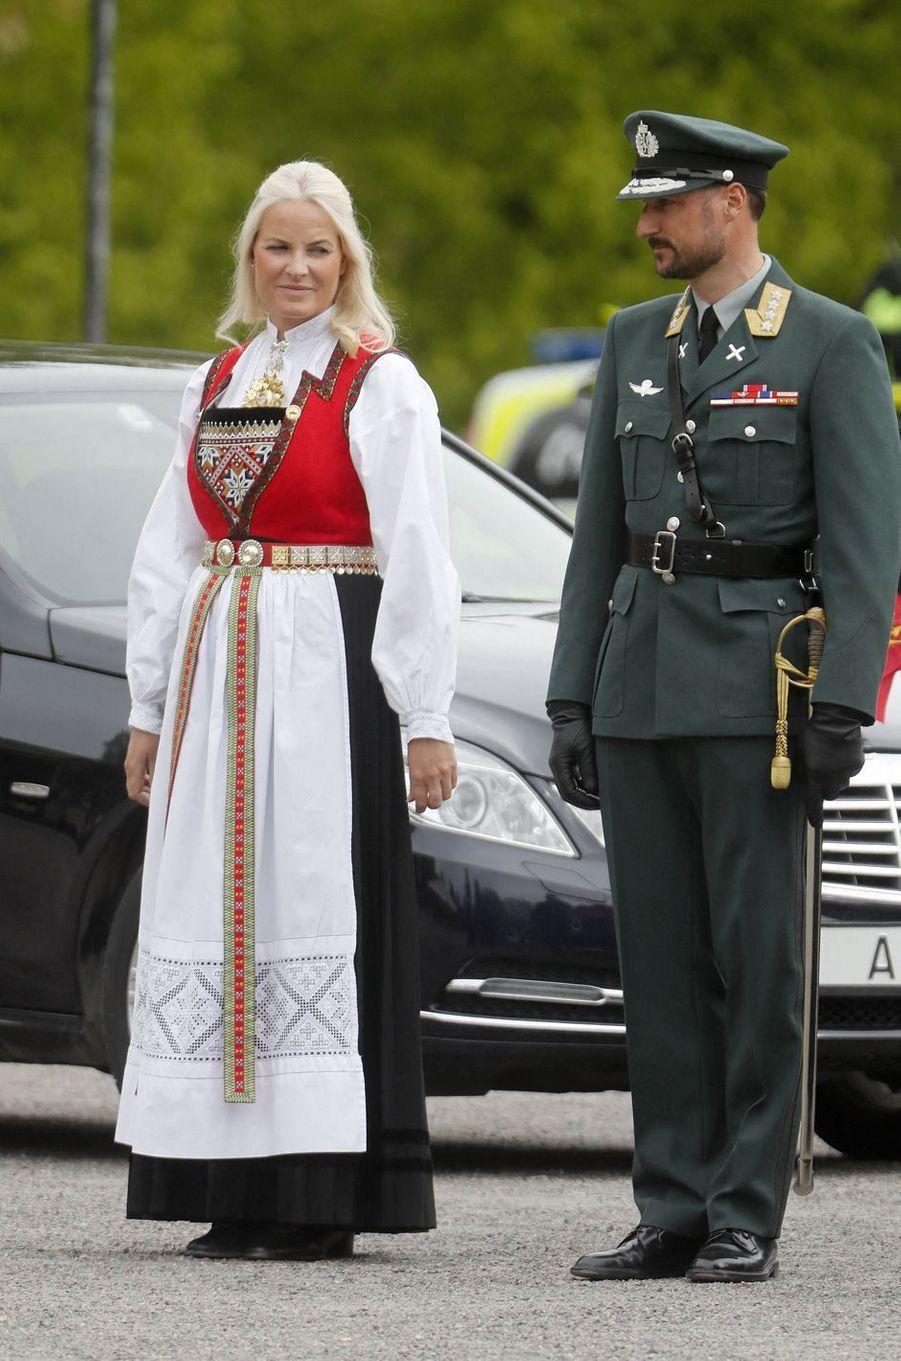 La princesse Mette-Marit, en bunad, et le prince Haakon de Norvège à Oslo, le 8 mai 2020